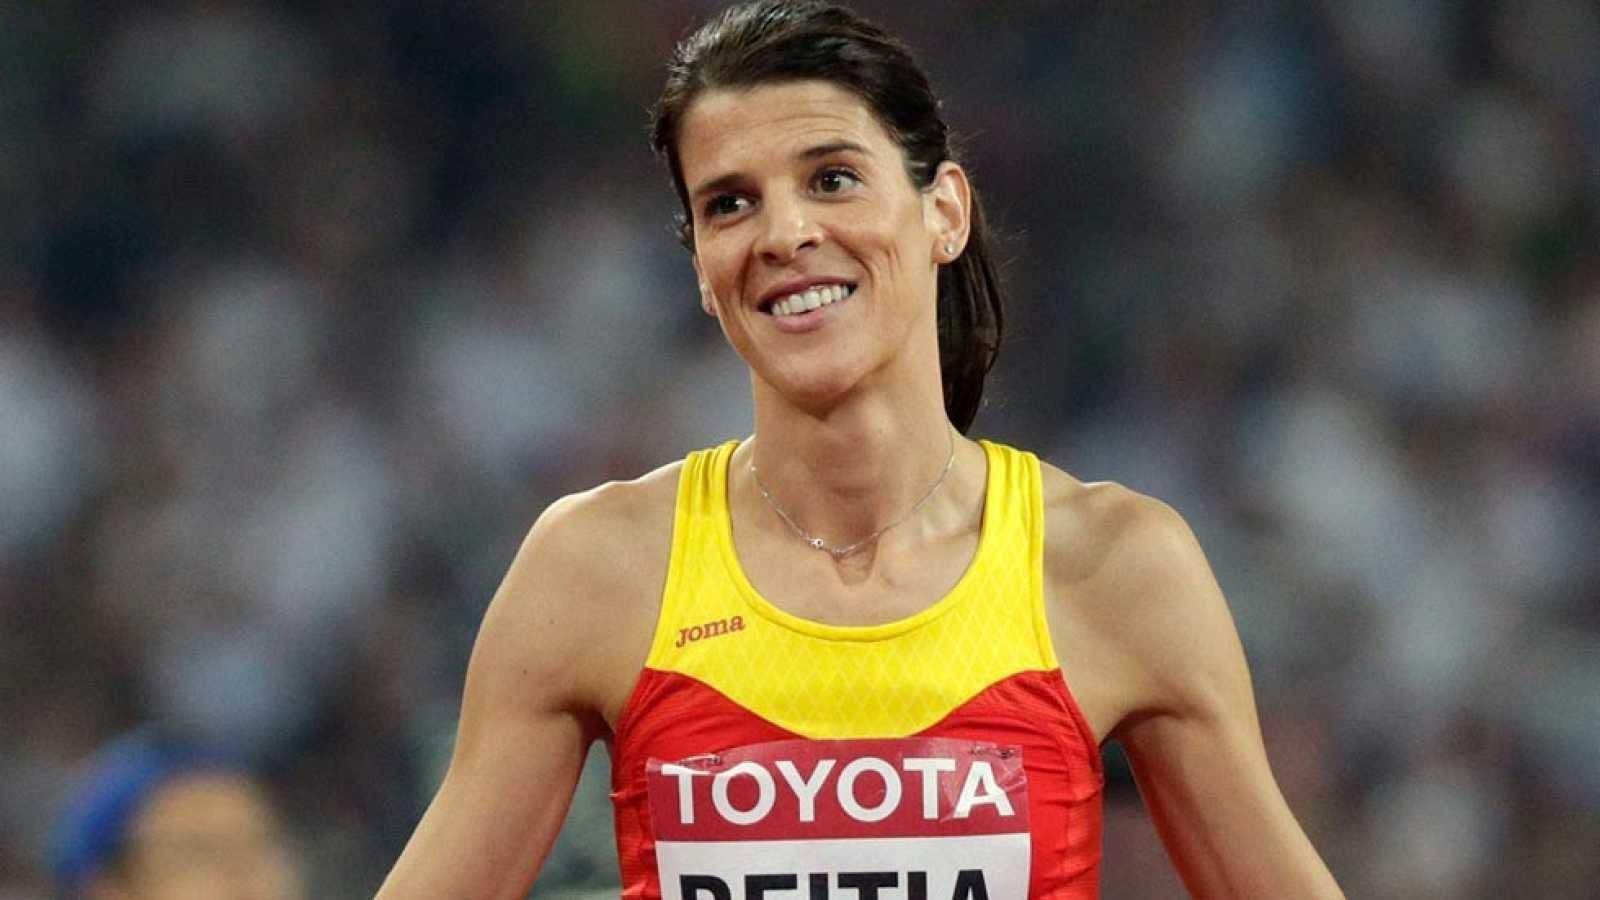 La atleta española, Ruth Beitia